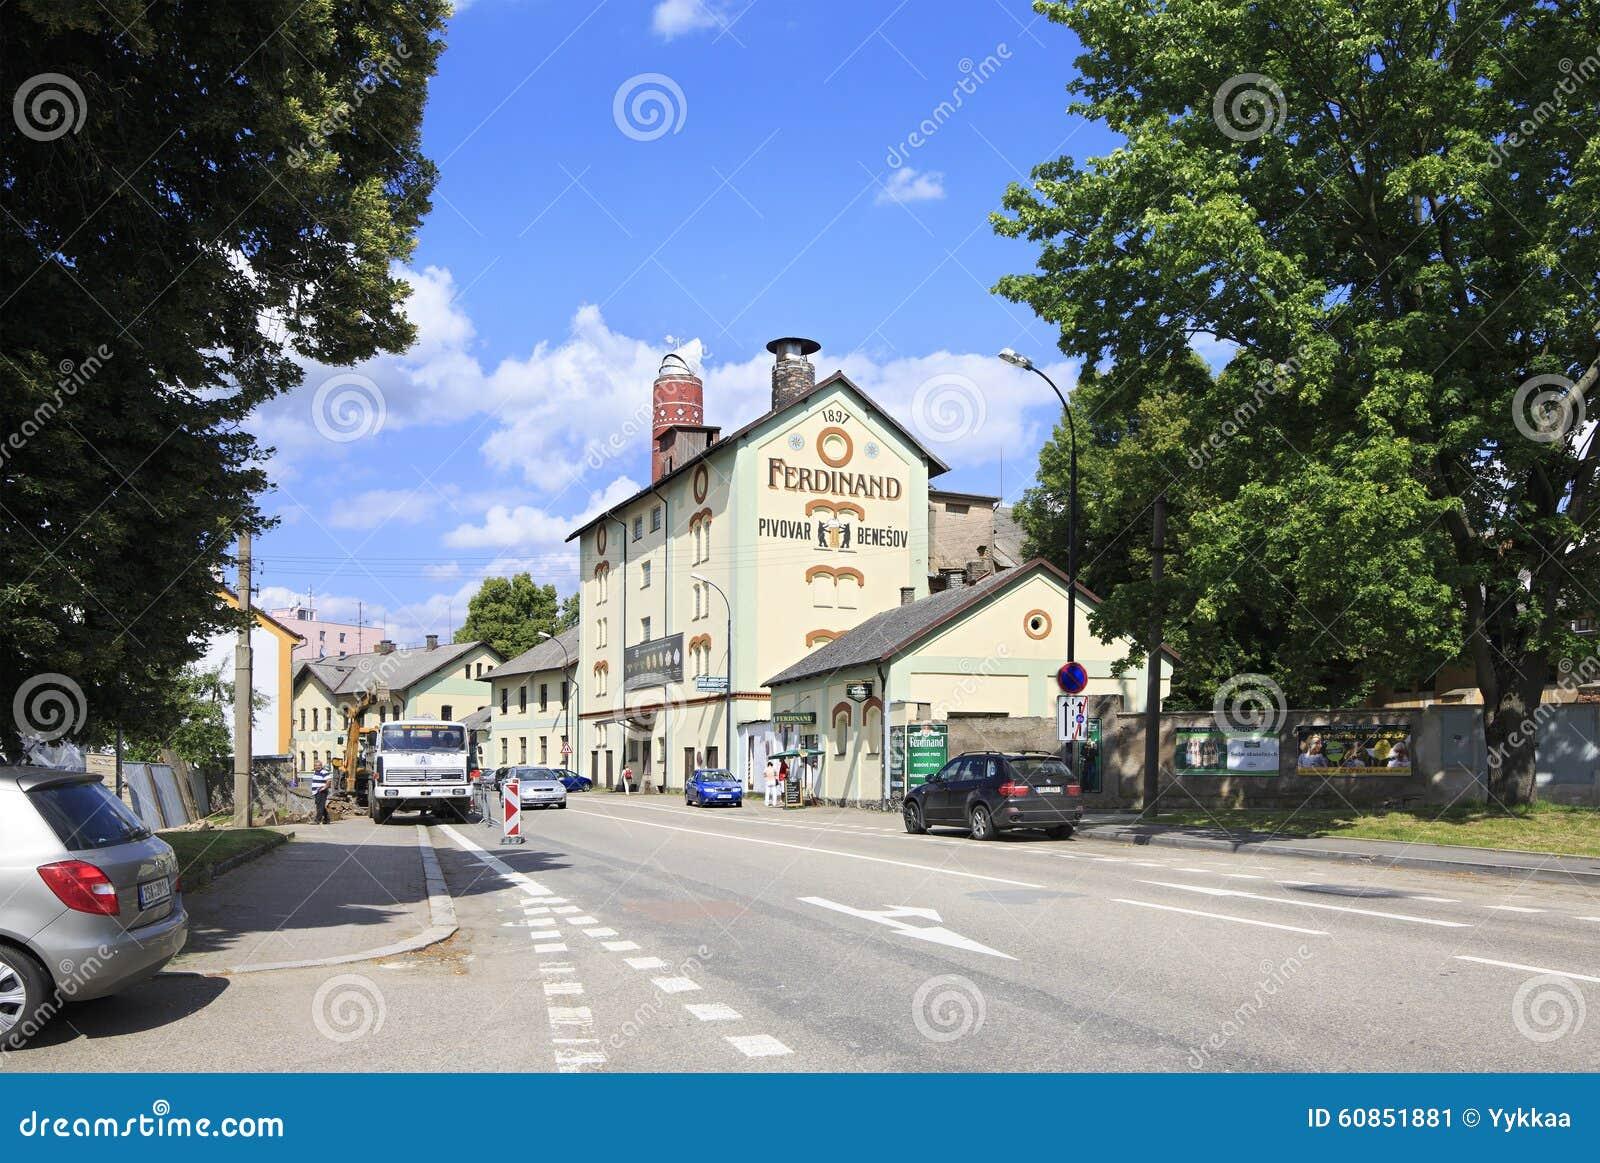 Ferdinand Brewery i Benesoven